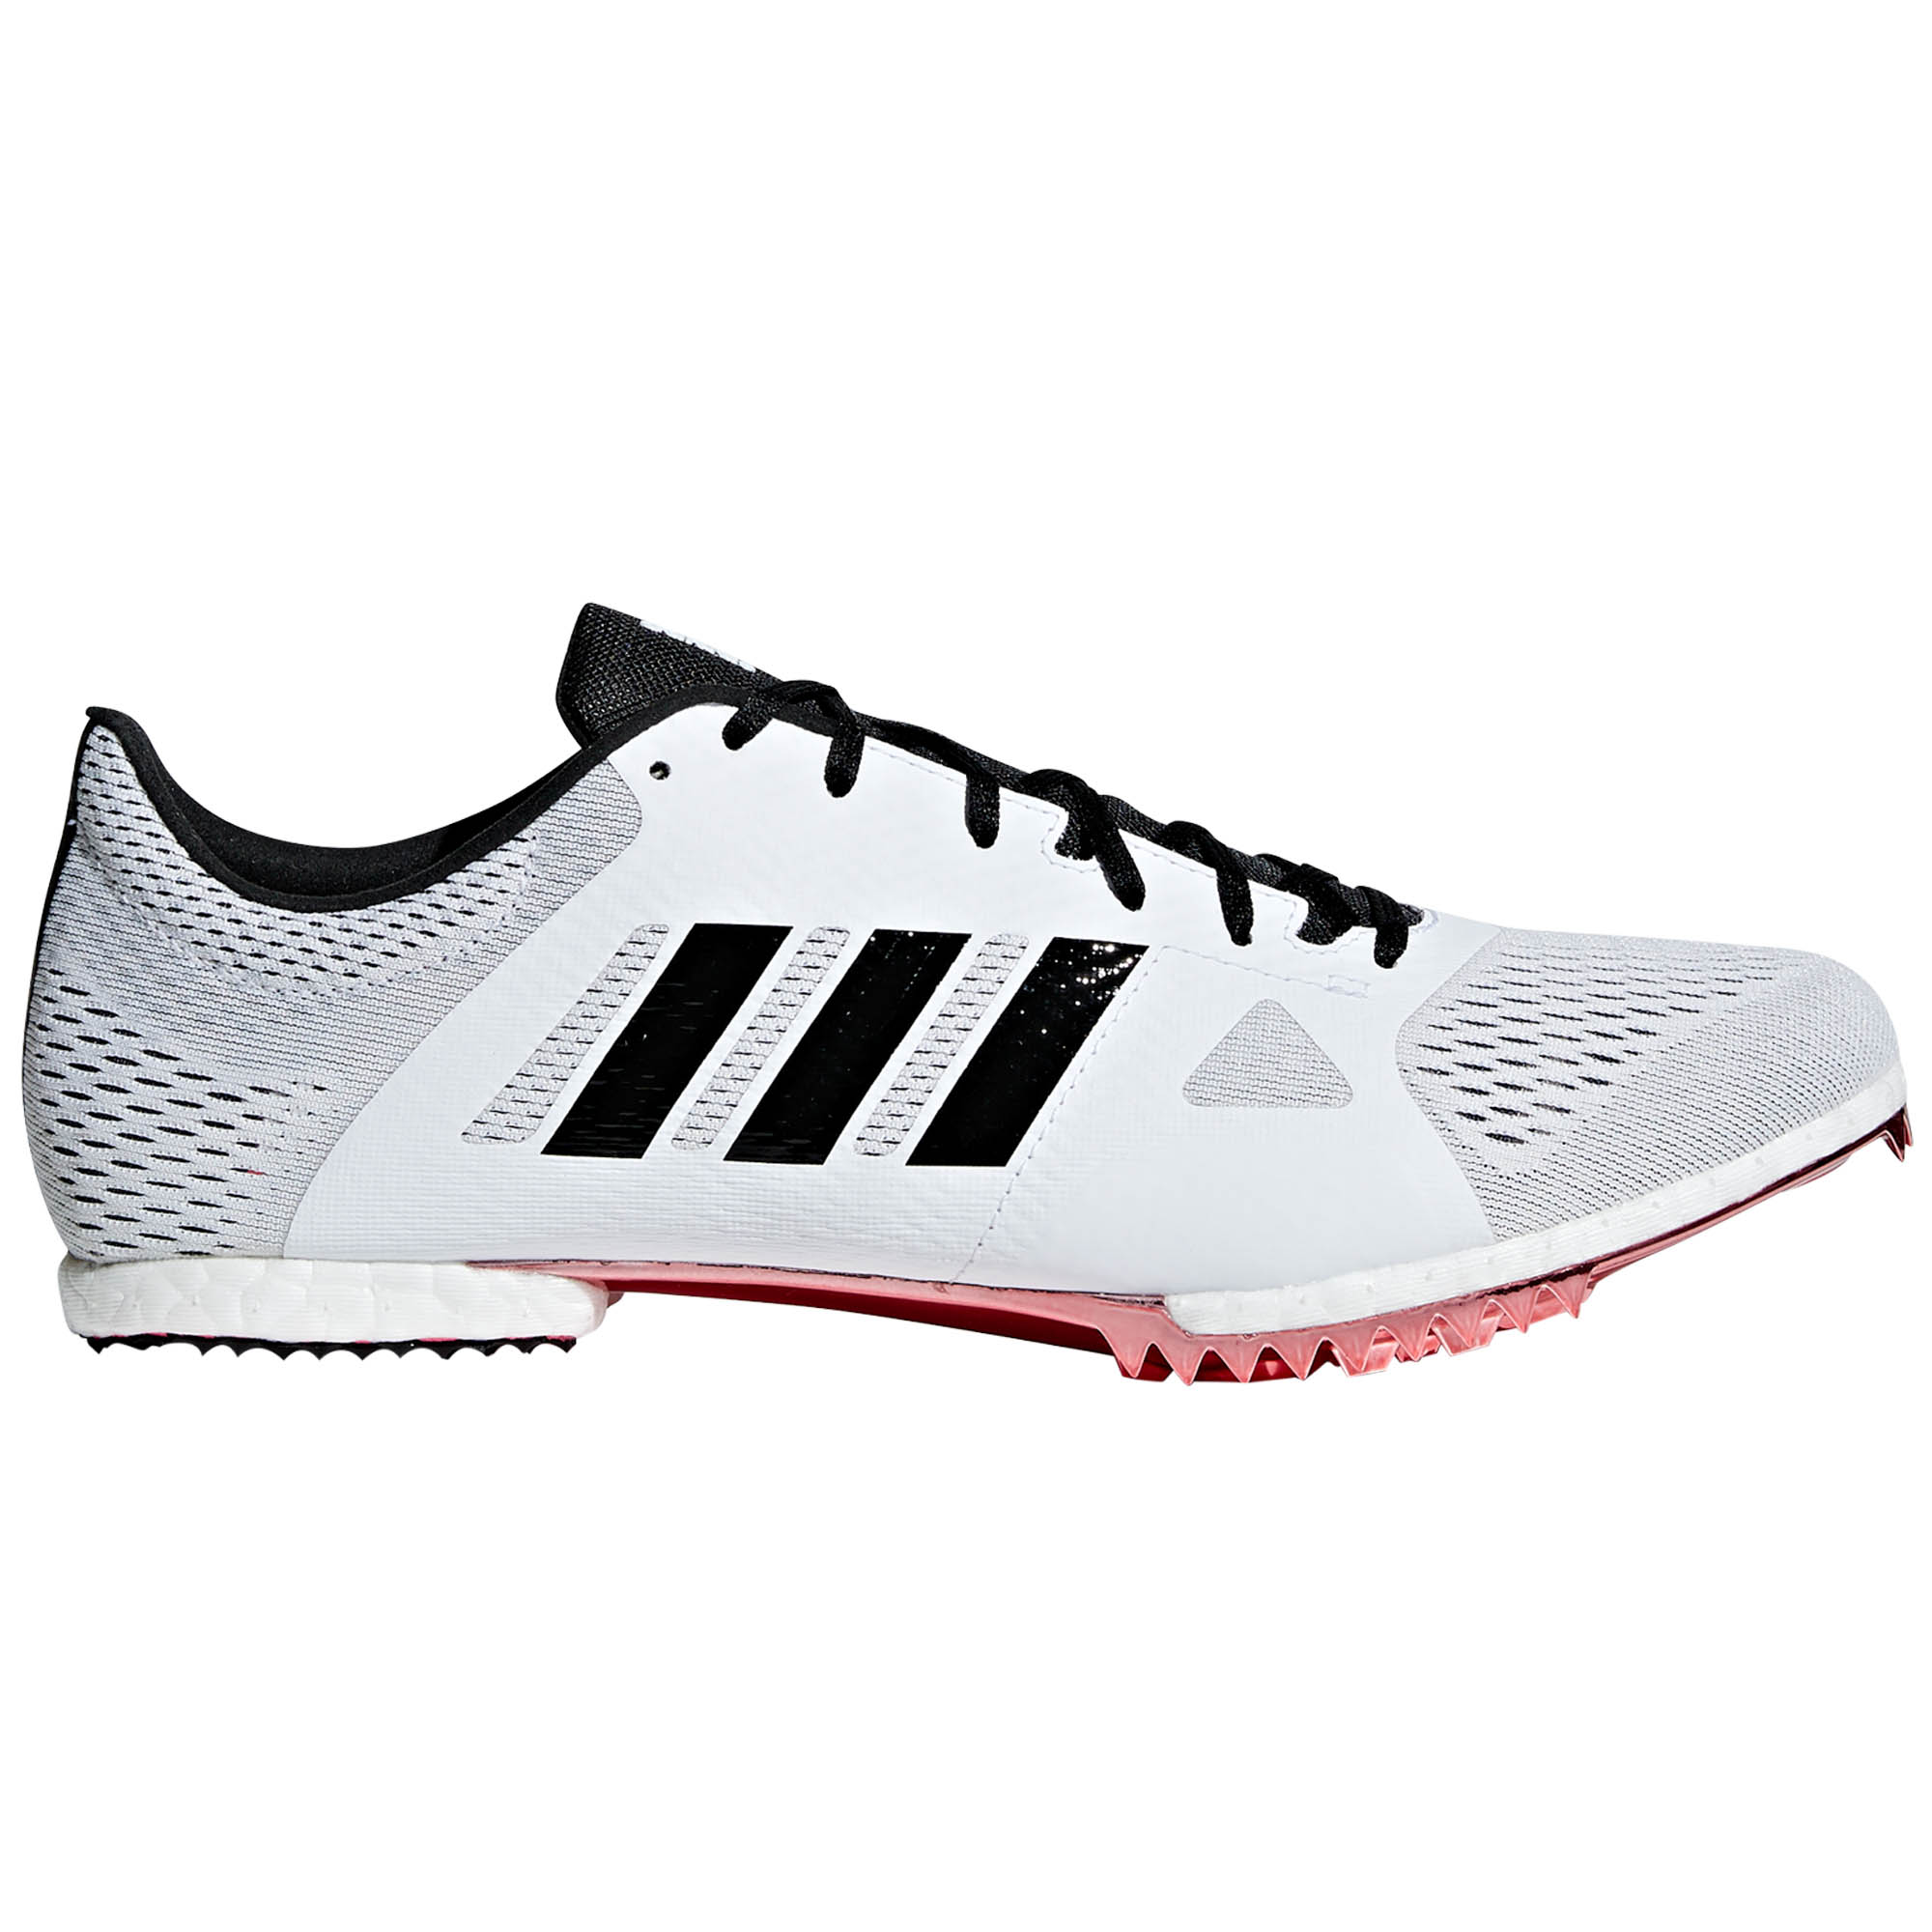 Training Gear Depot Boxing | adidas Adistar Boxing Shoes